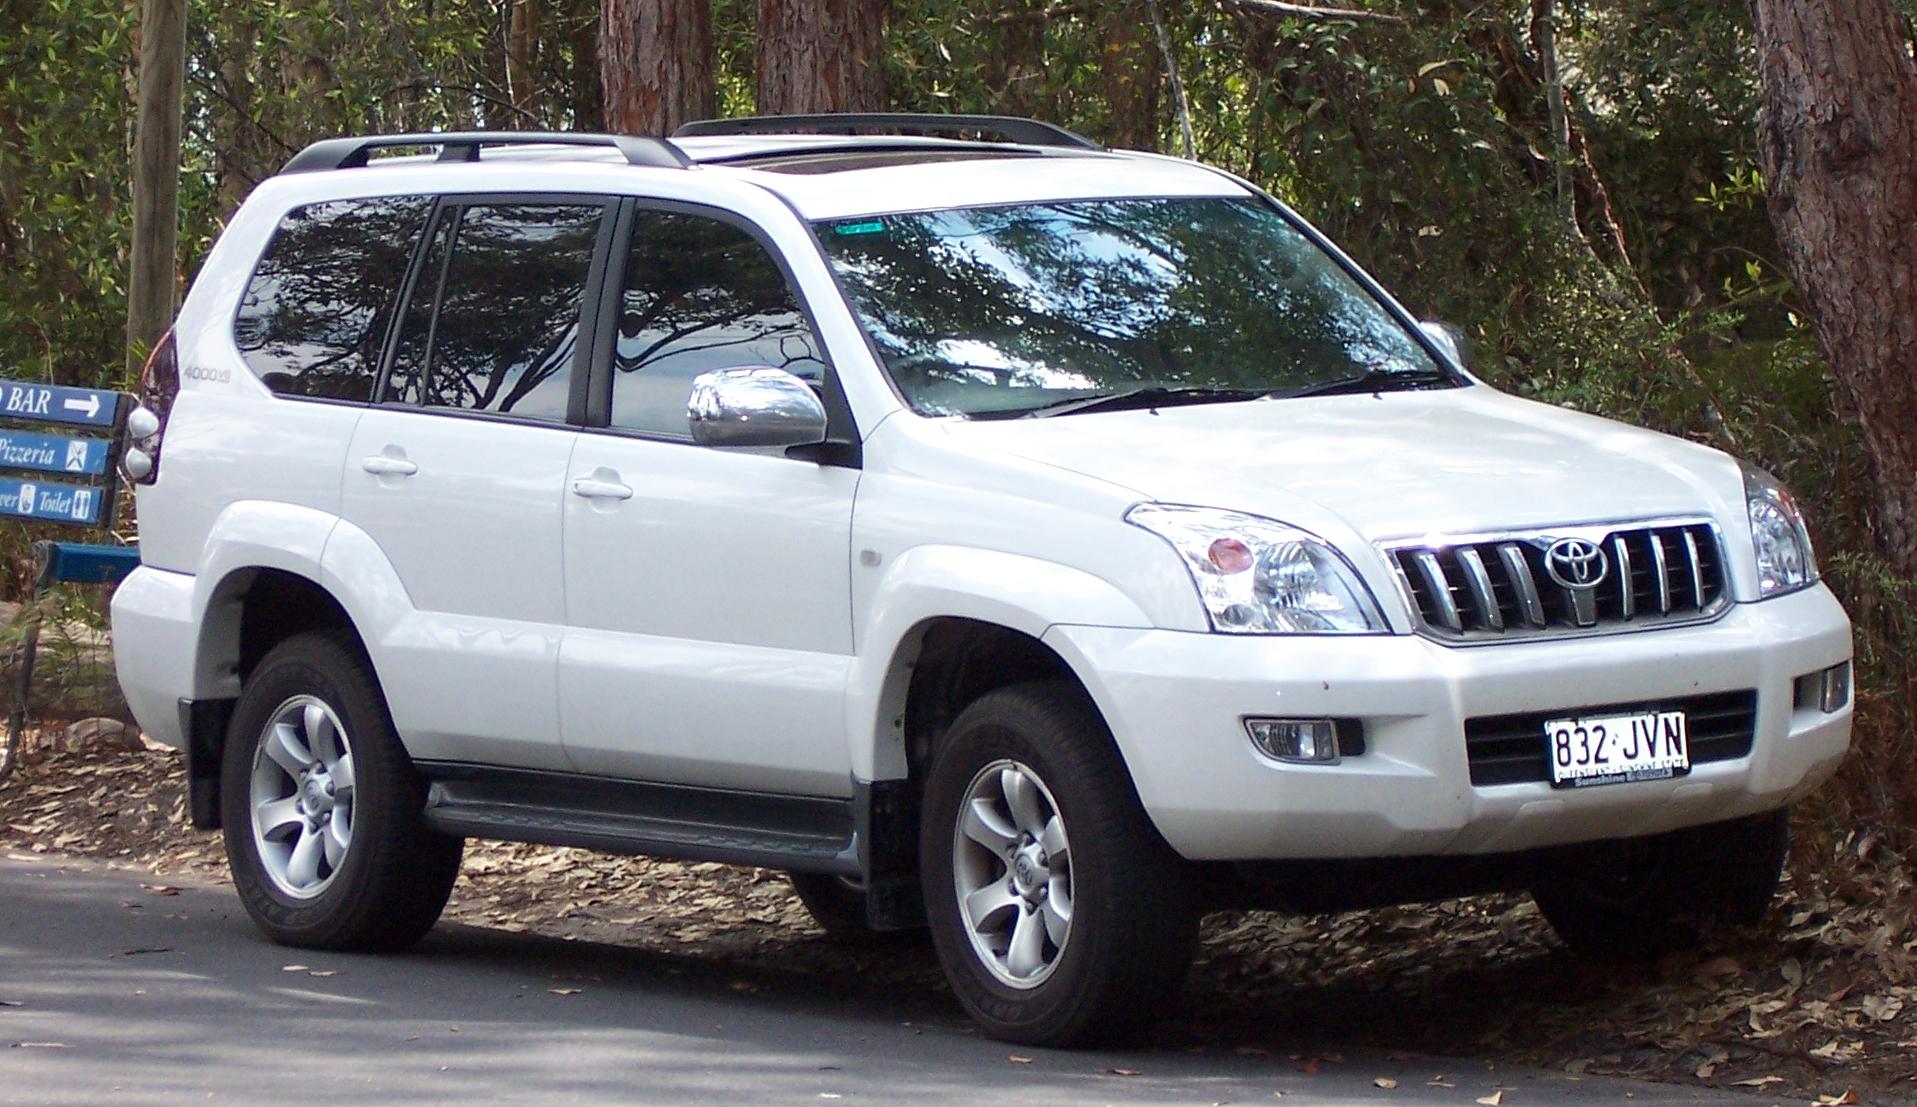 2003 2007 Toyota Land Cruiser Prado (GRJ120R) 02